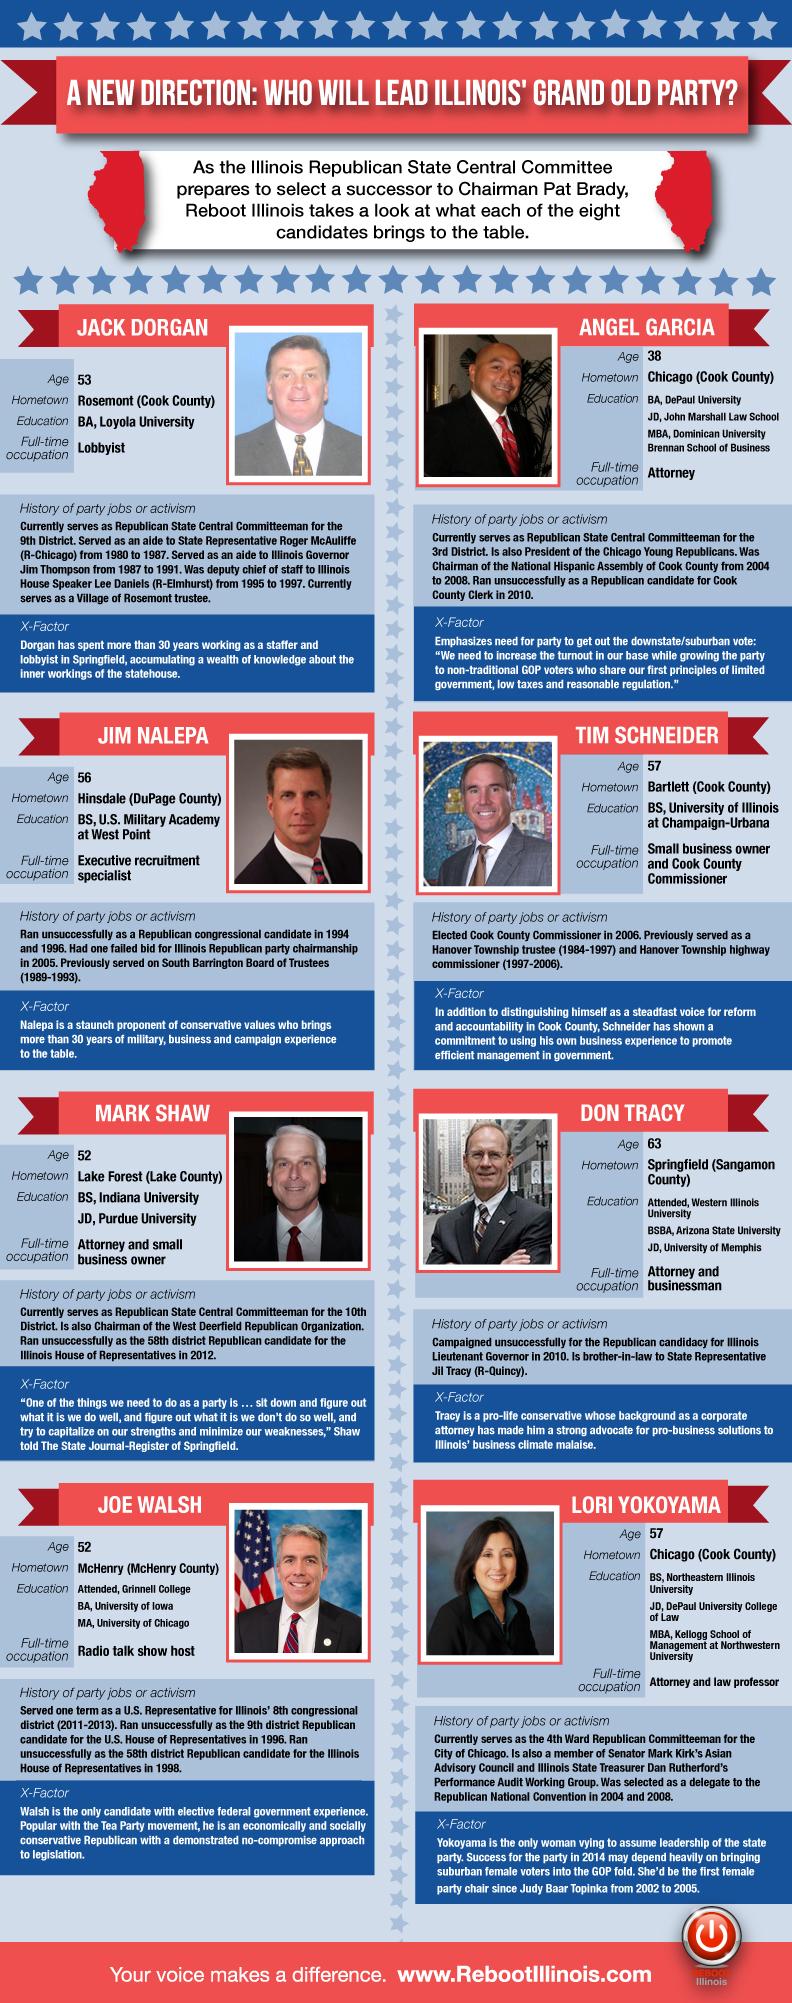 2013-07-02-StateGOPChairCandidates_infographic2.jpg